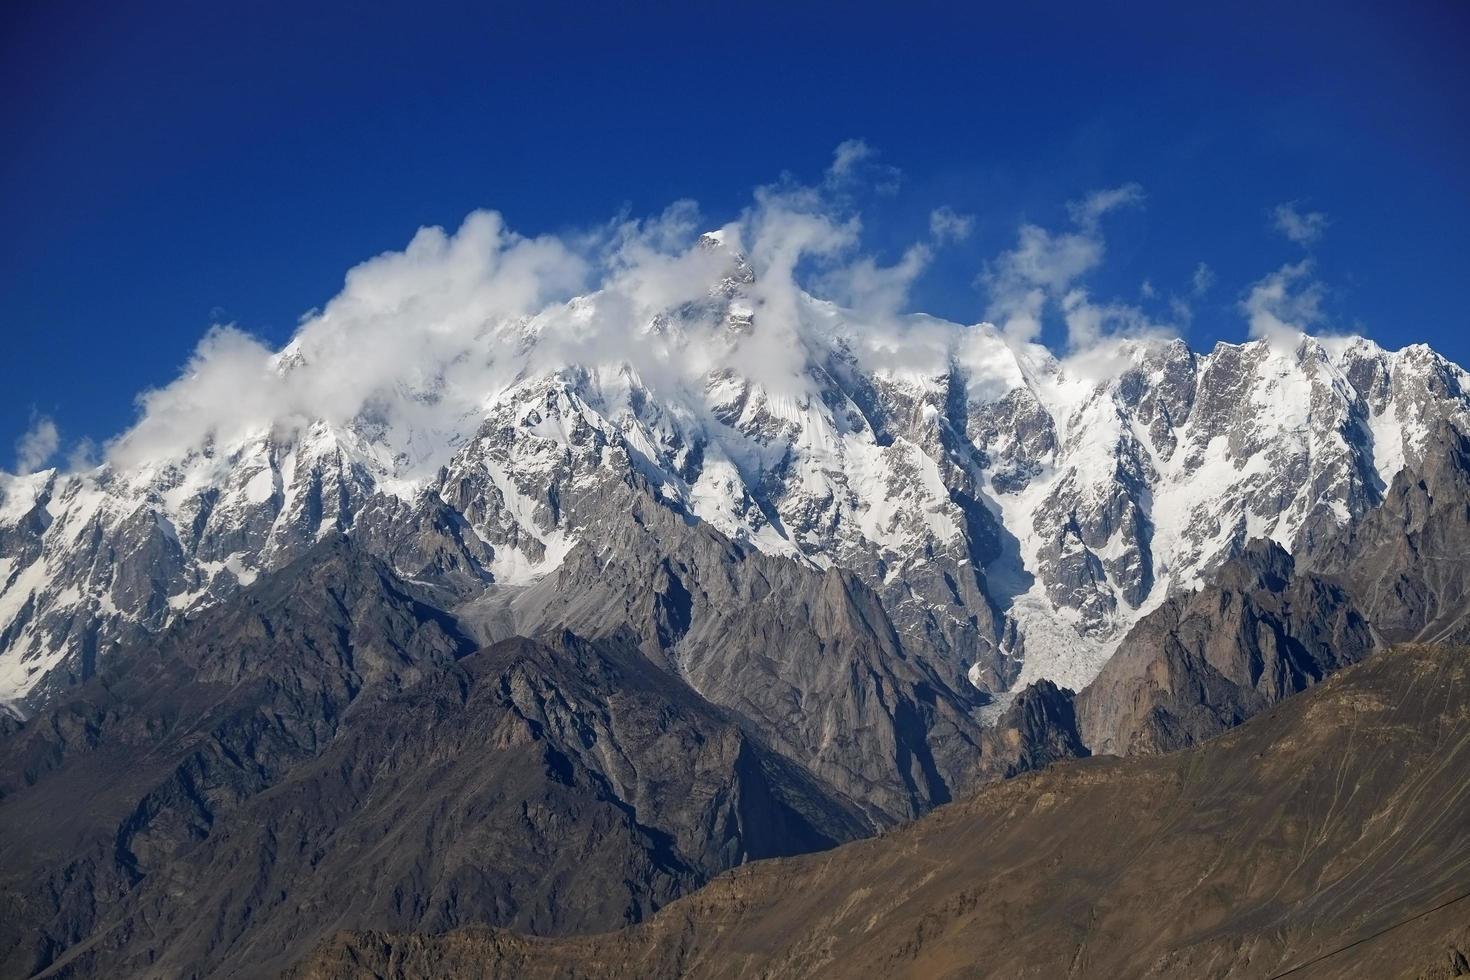 montaña ultar sar foto